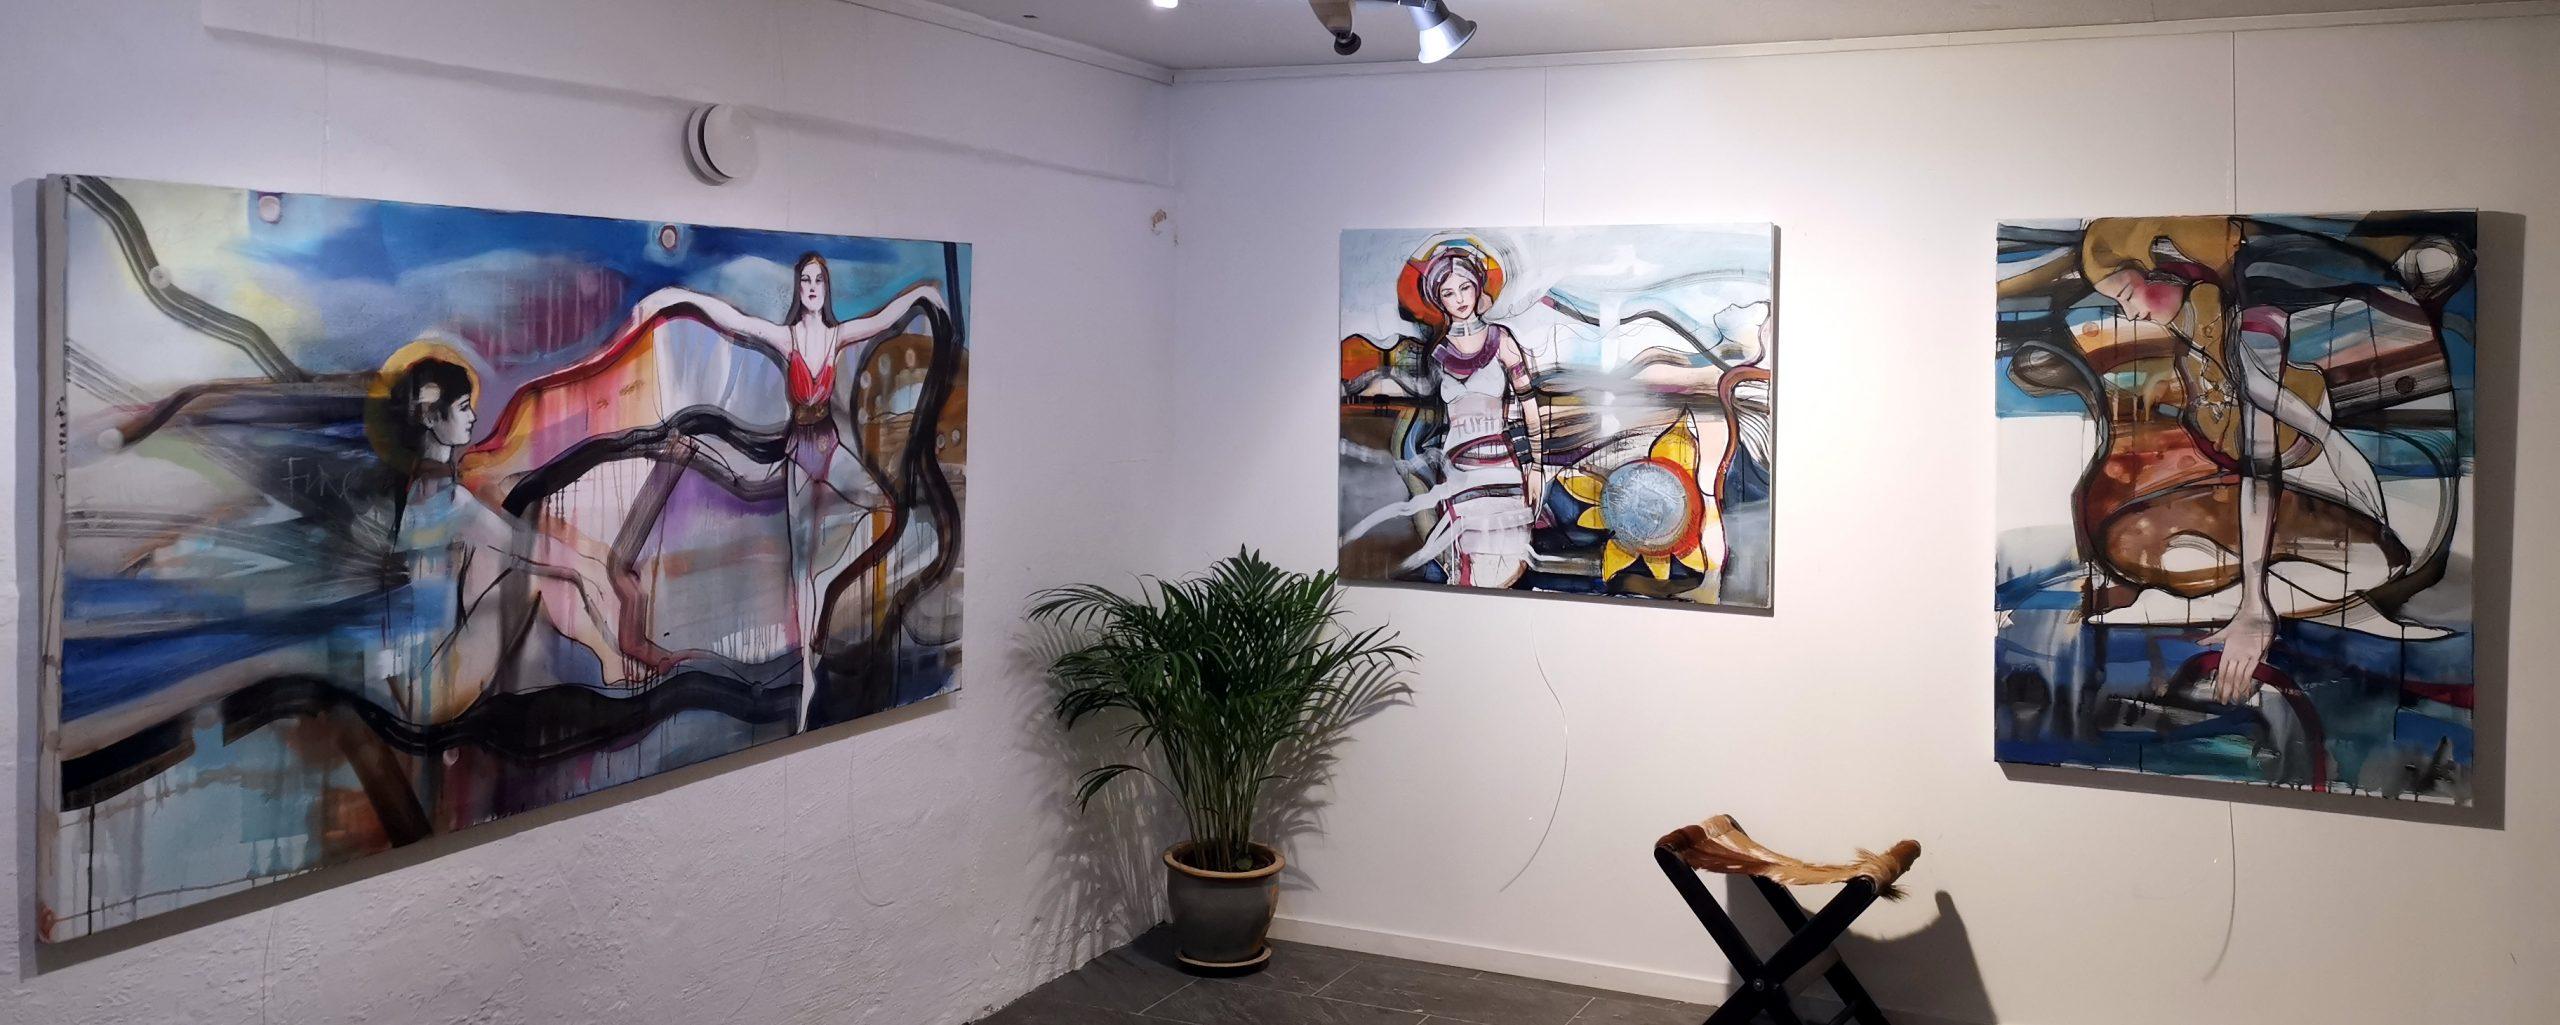 billedkunst art verena waddell studio